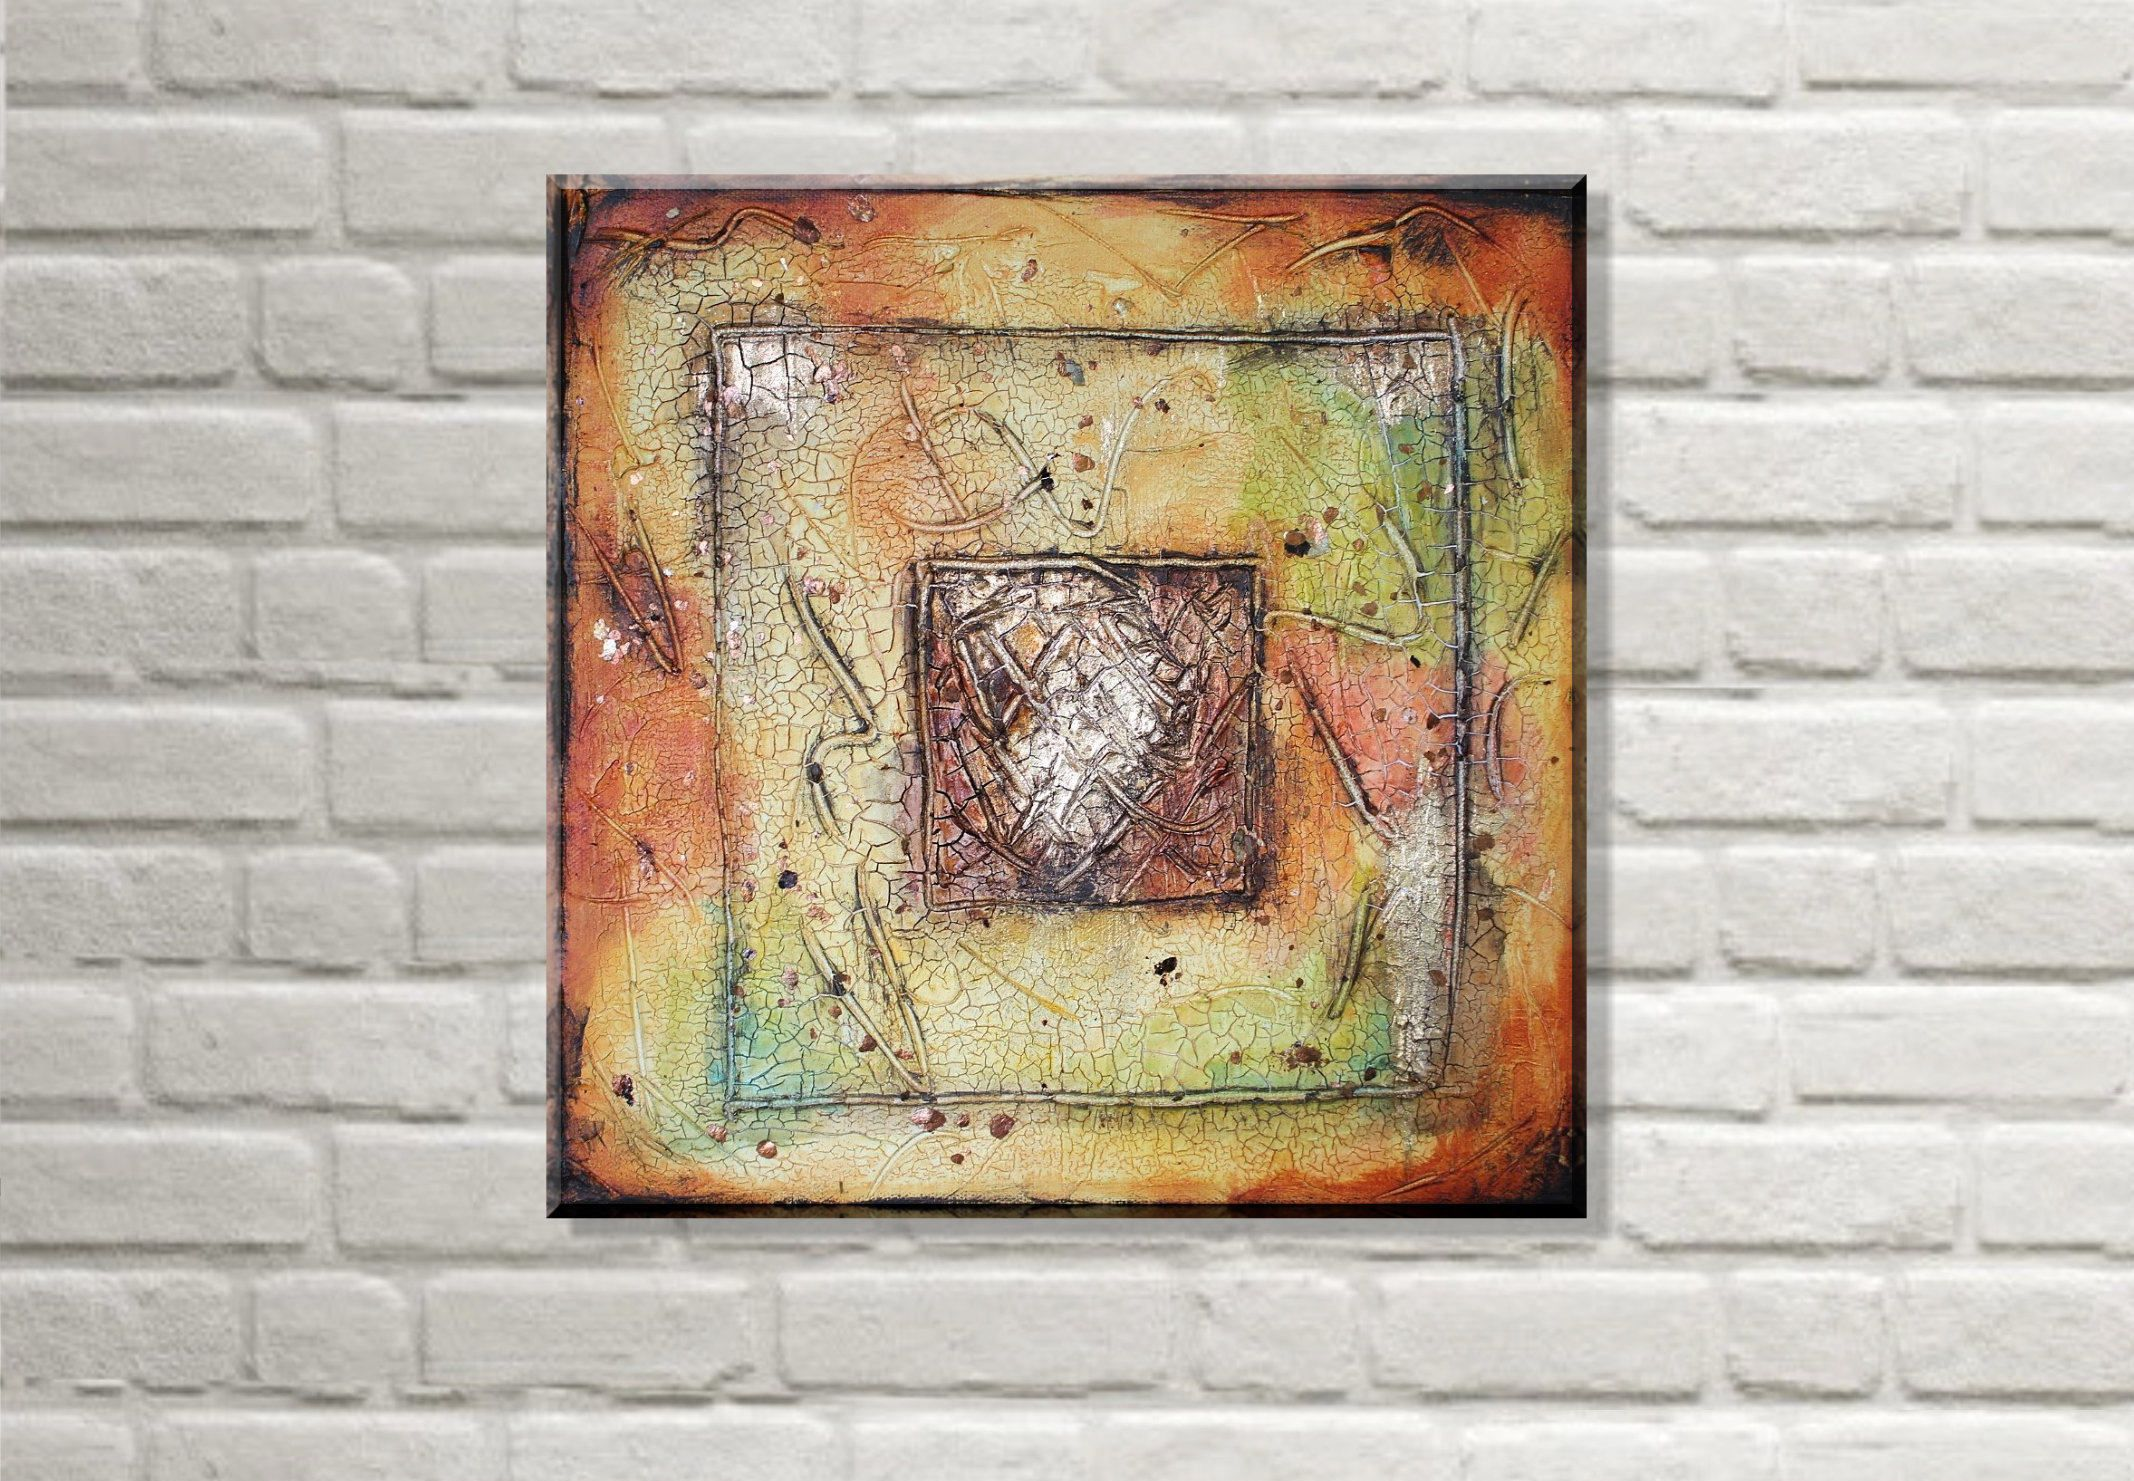 Acrylbild Abstrakt Erdtöne Bronze | Sahara 30x30 cm | Acryl auf ...